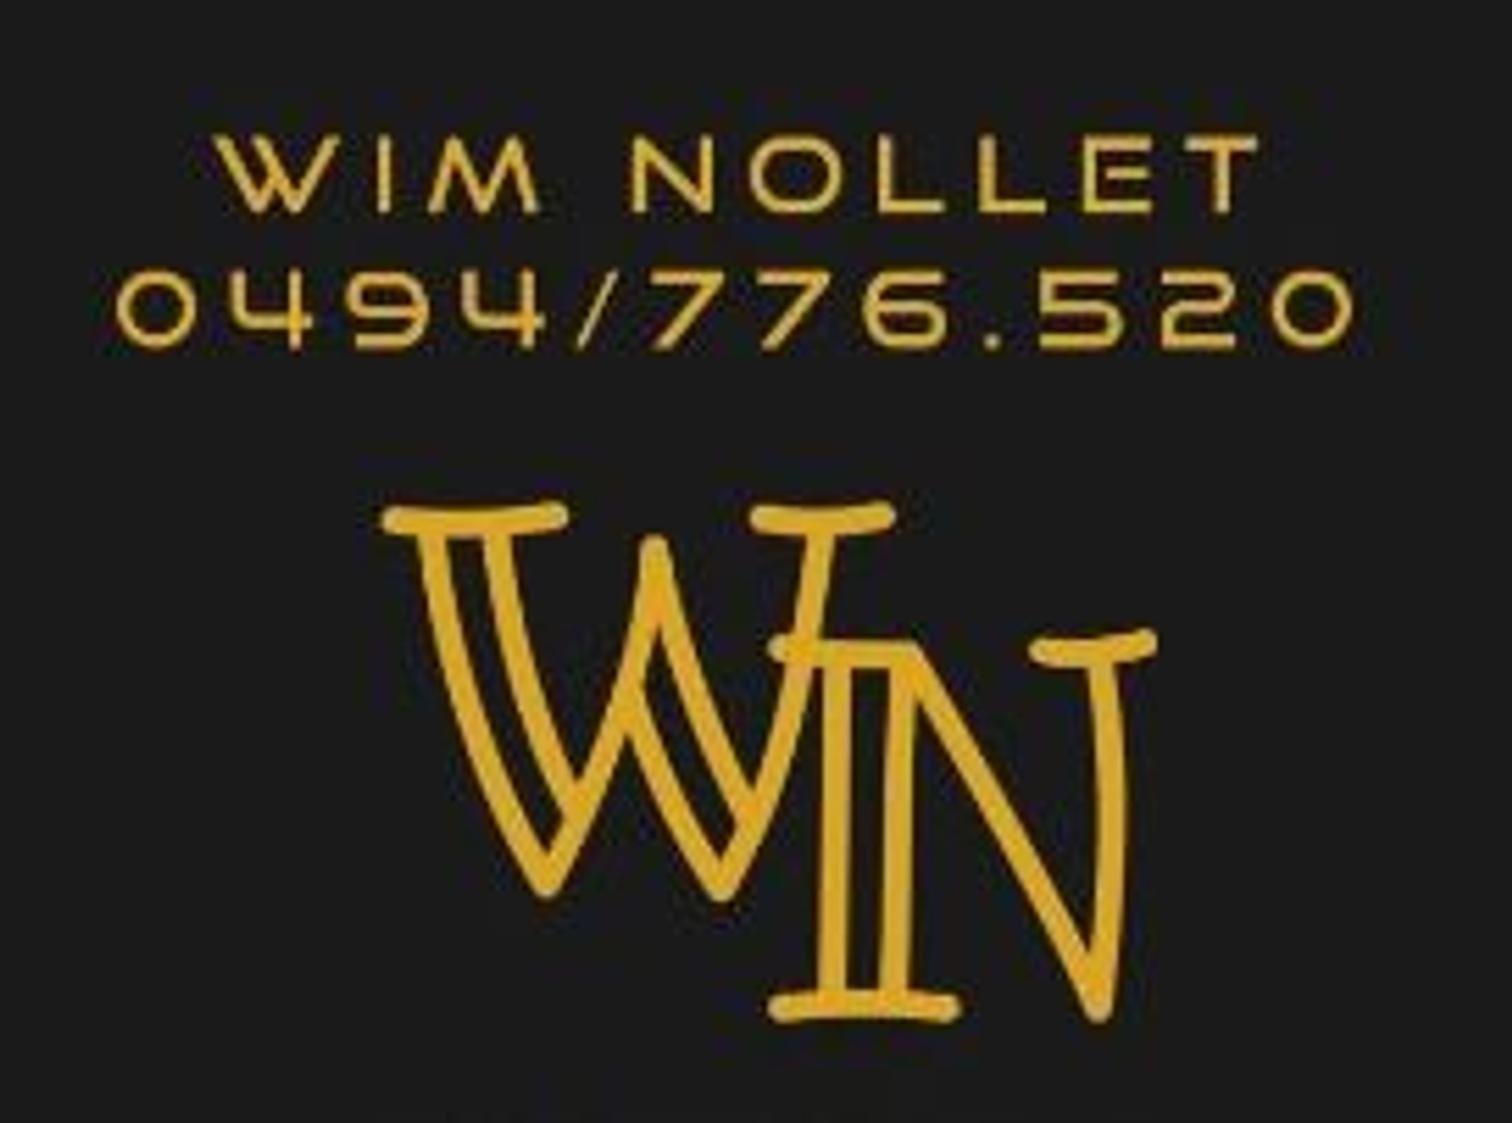 Wim Nollet logo